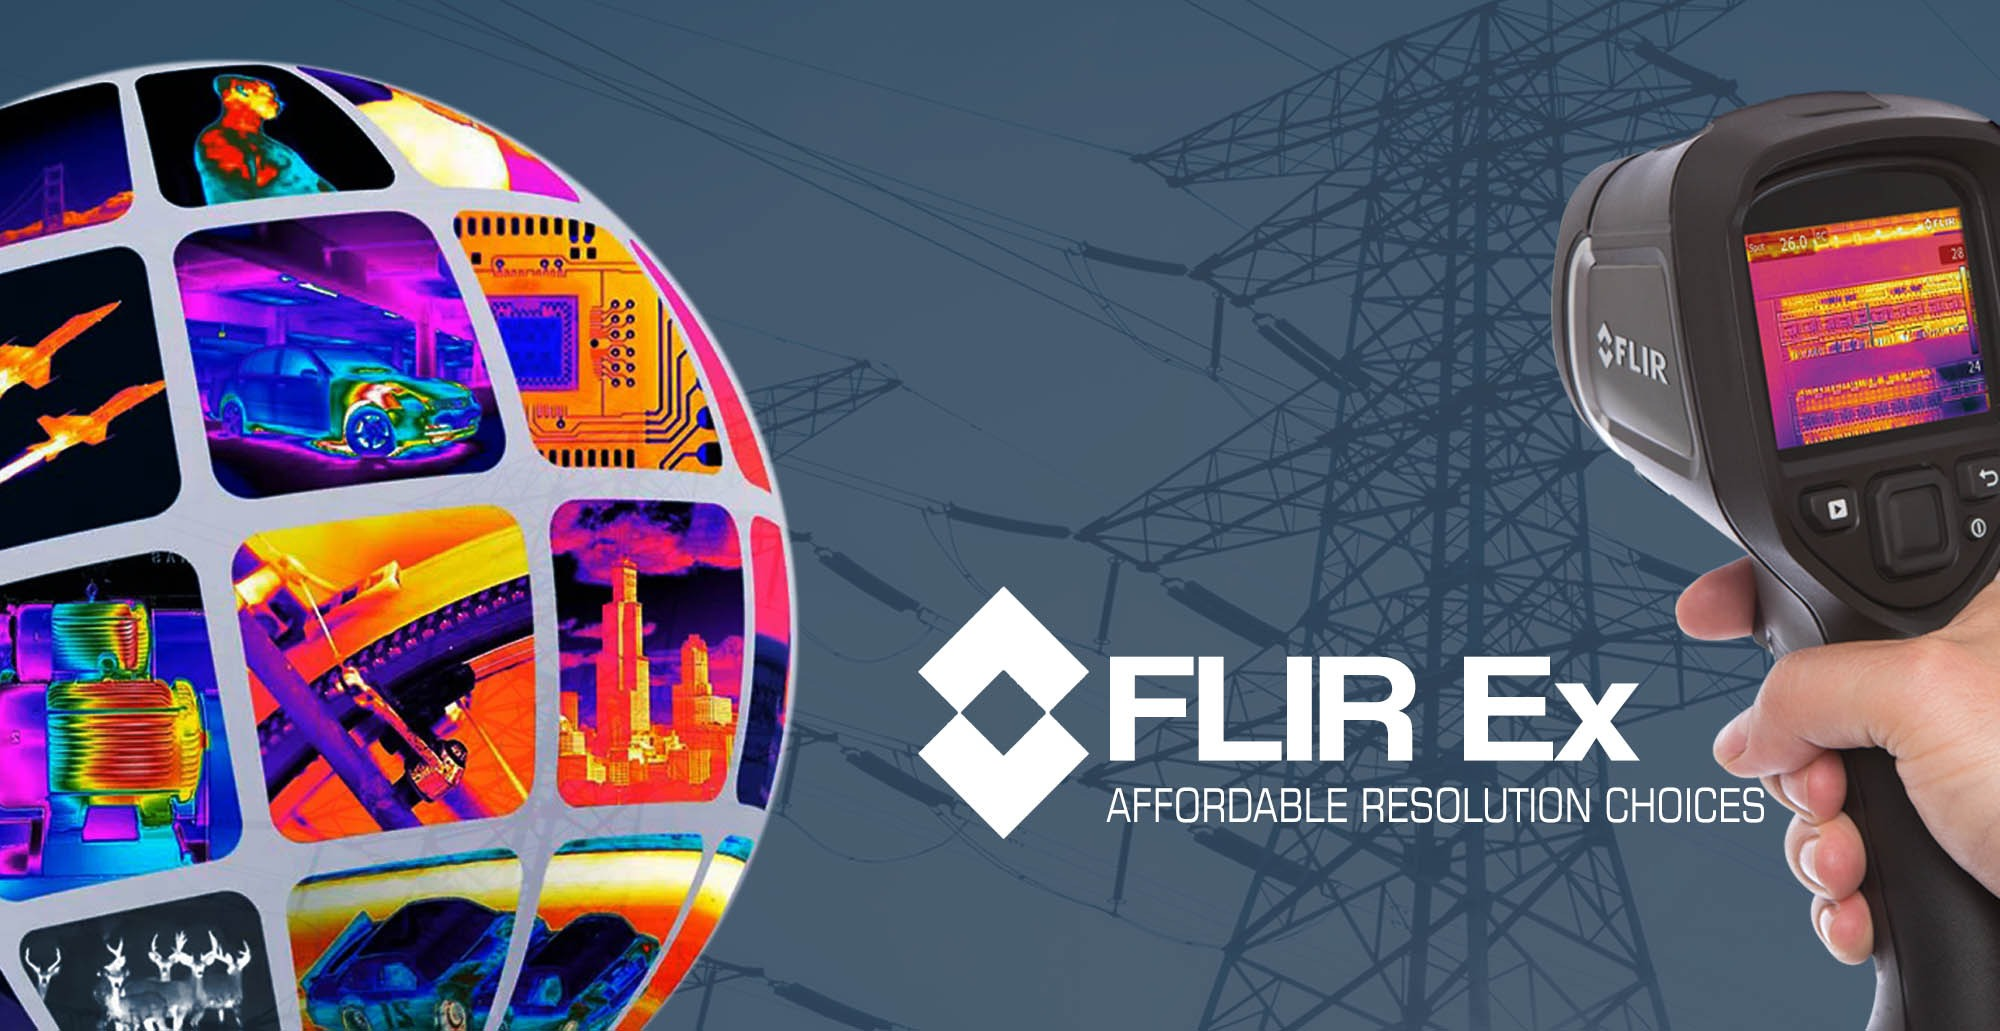 FLIR E4 FOR AFFORDABLE RESOLUTION CHOICES